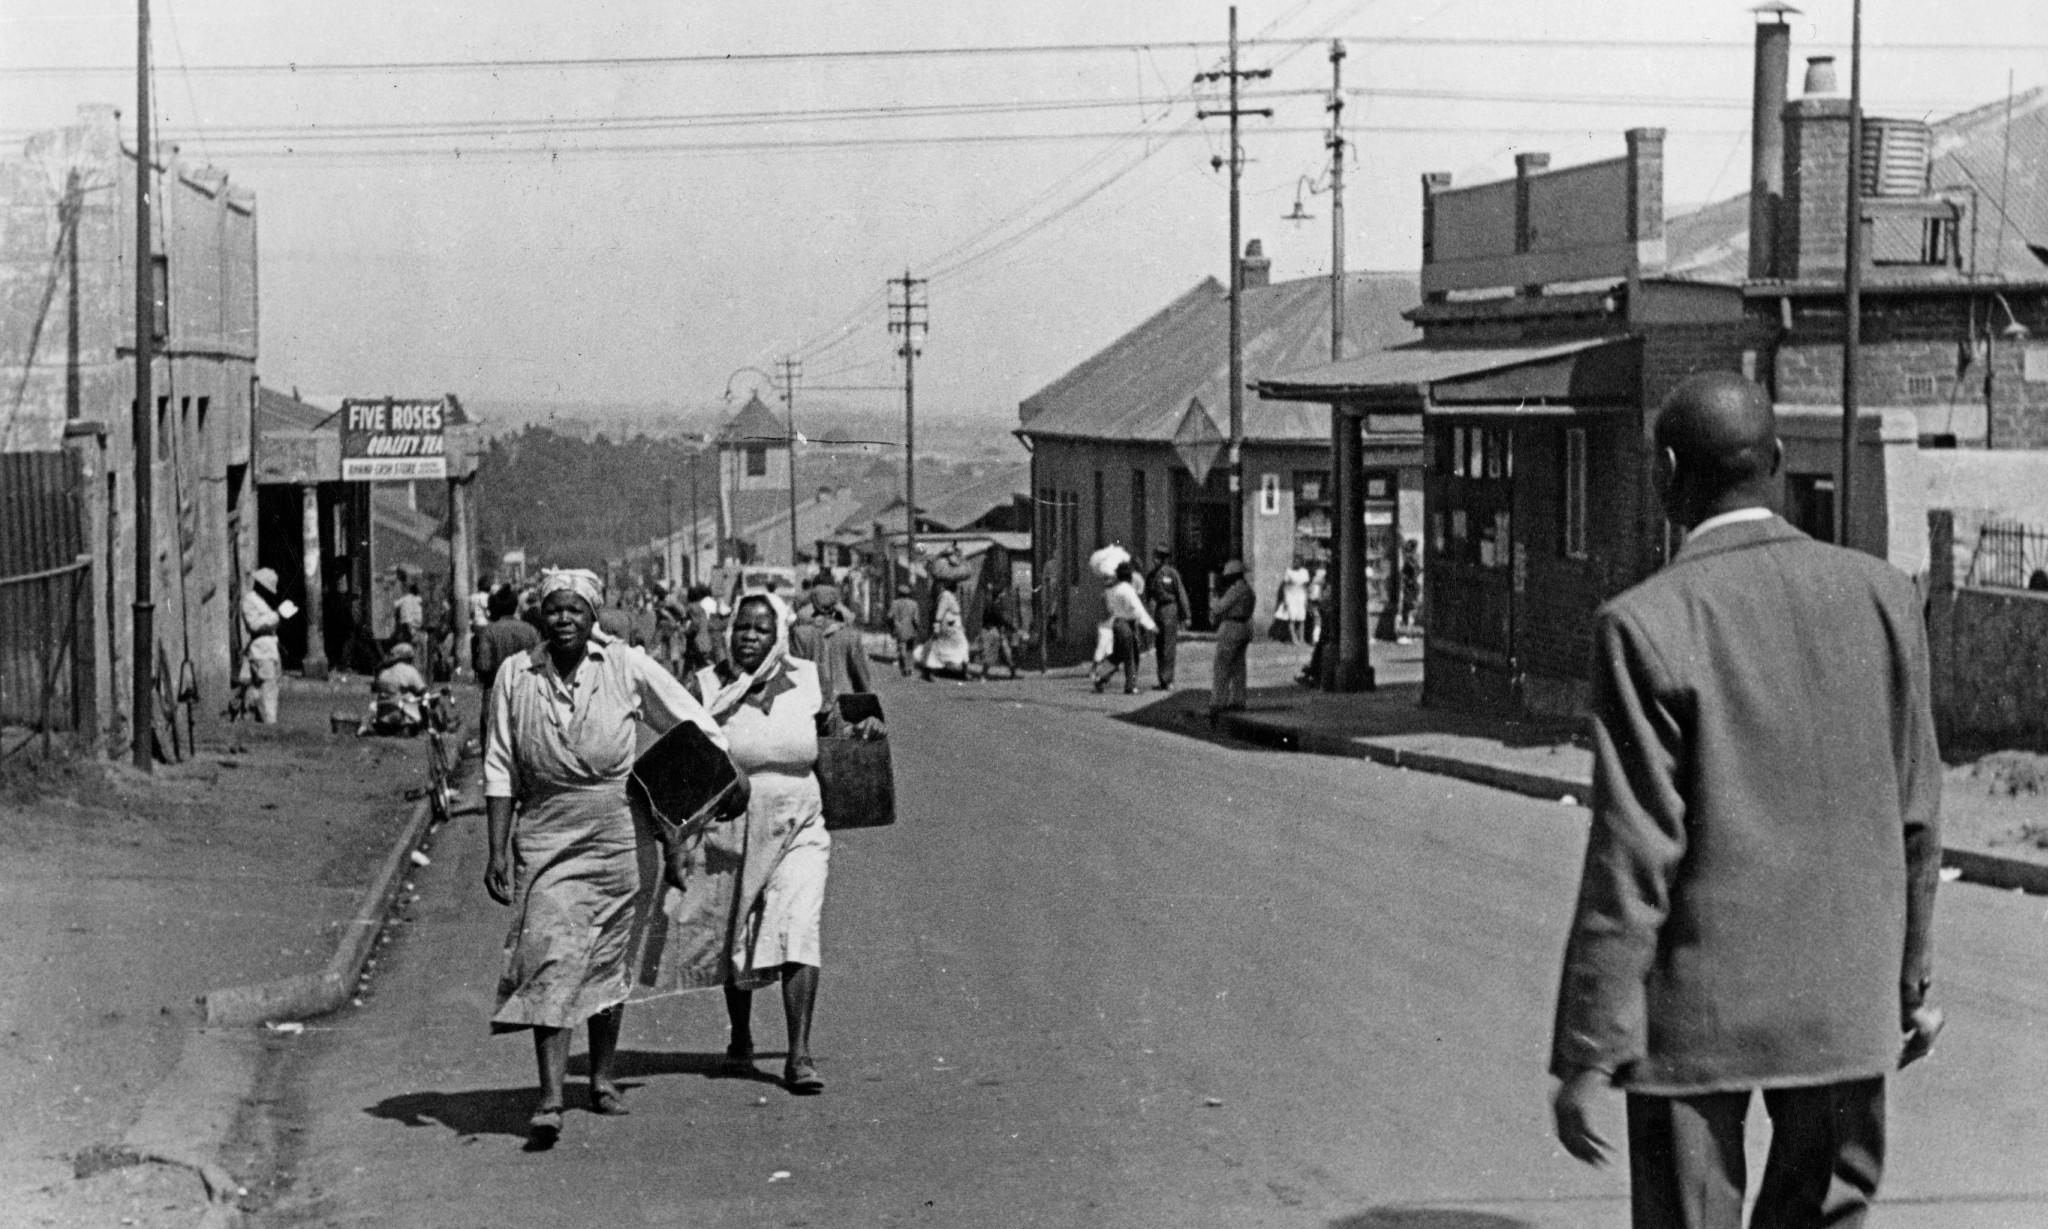 Story of cities #19: Johannesburg's apartheid purge of vibrant Sophiatown